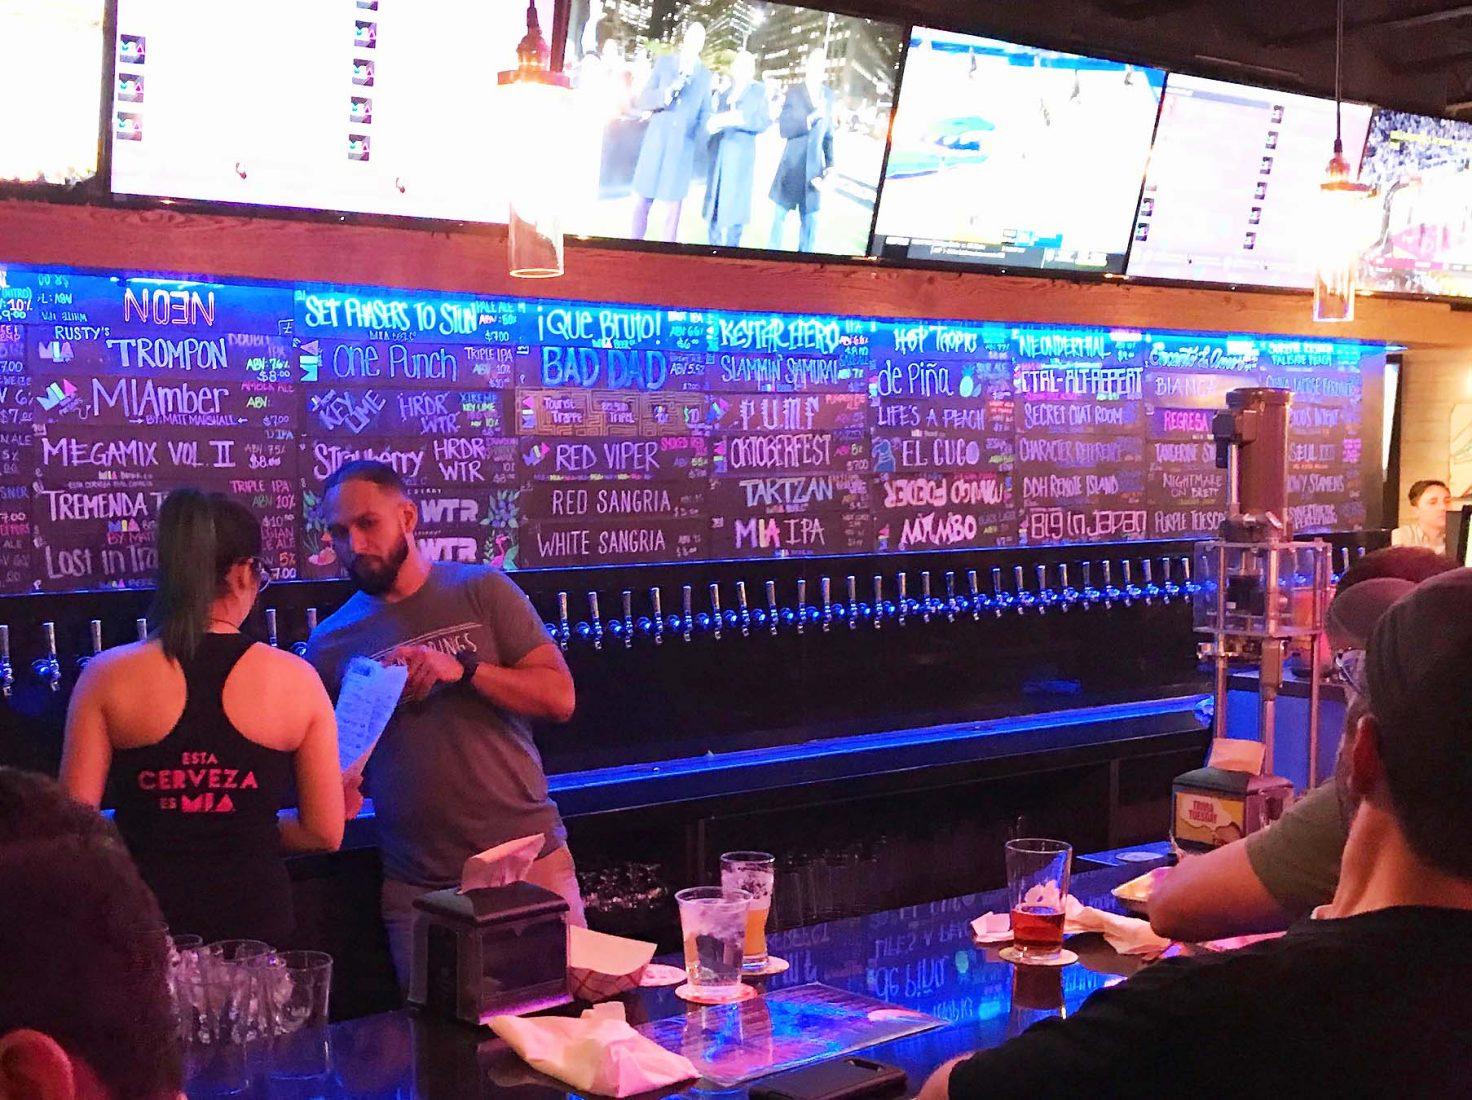 462. MIA Beer Company, Miami FL, 2019